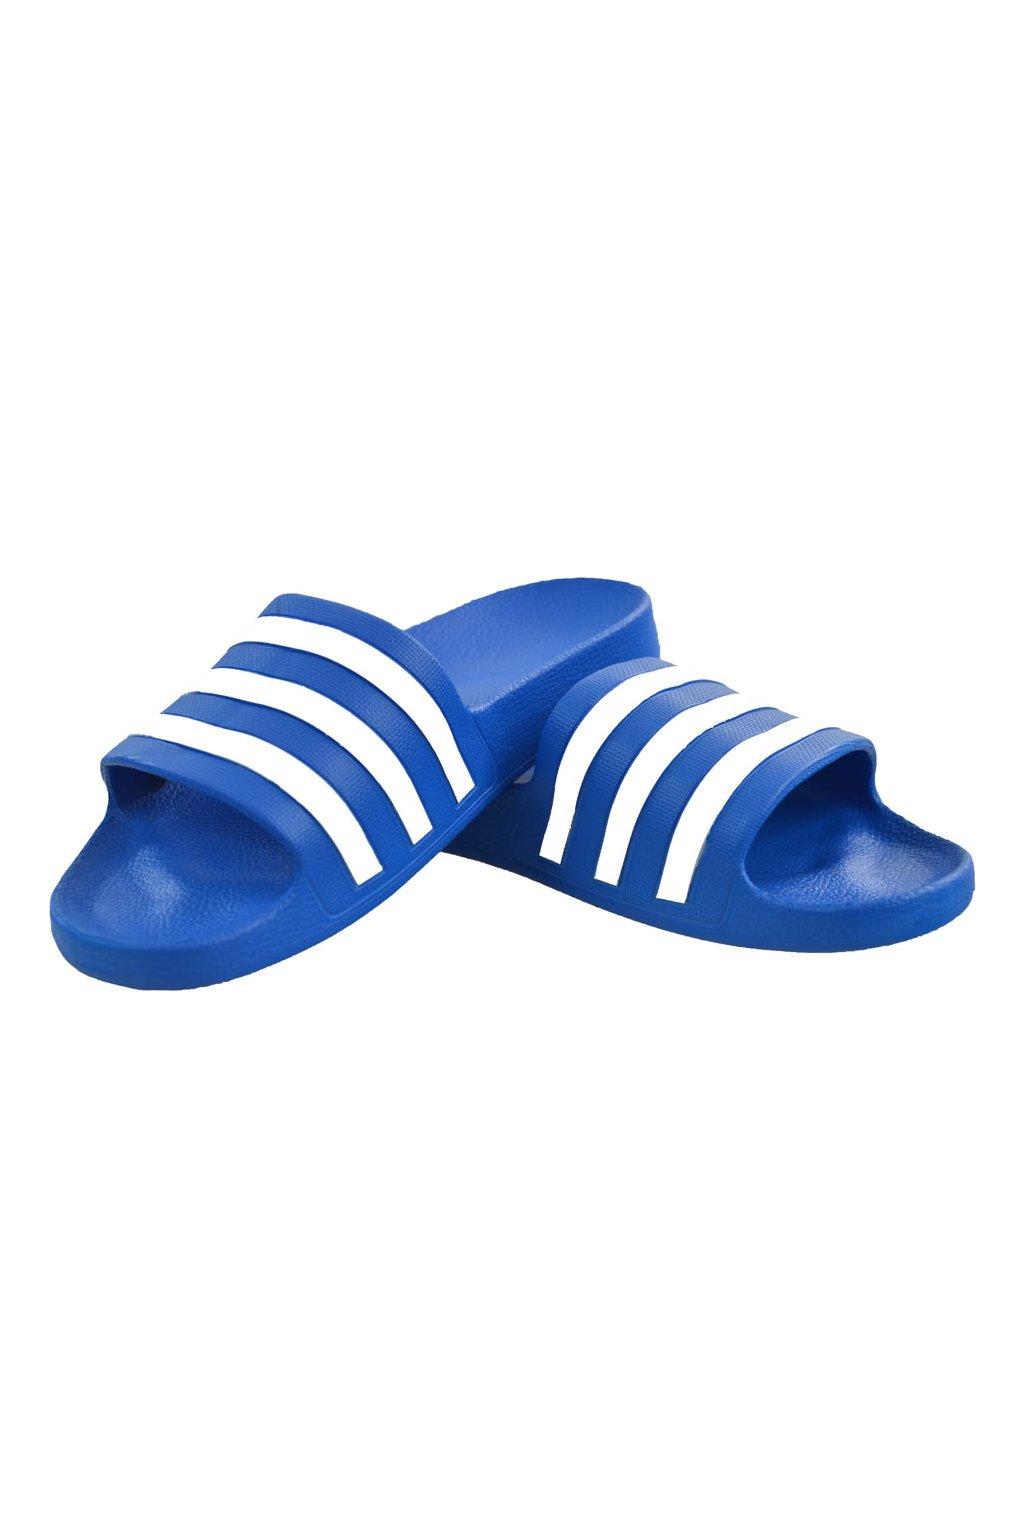 Šľapky Adidas Adilette Aqua blue F35541